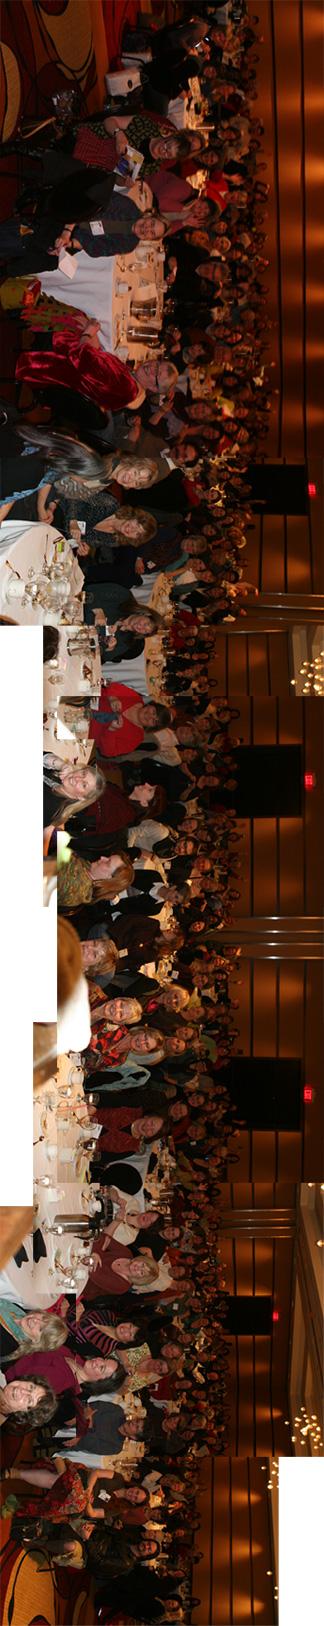 Madrona 2011 Banquet